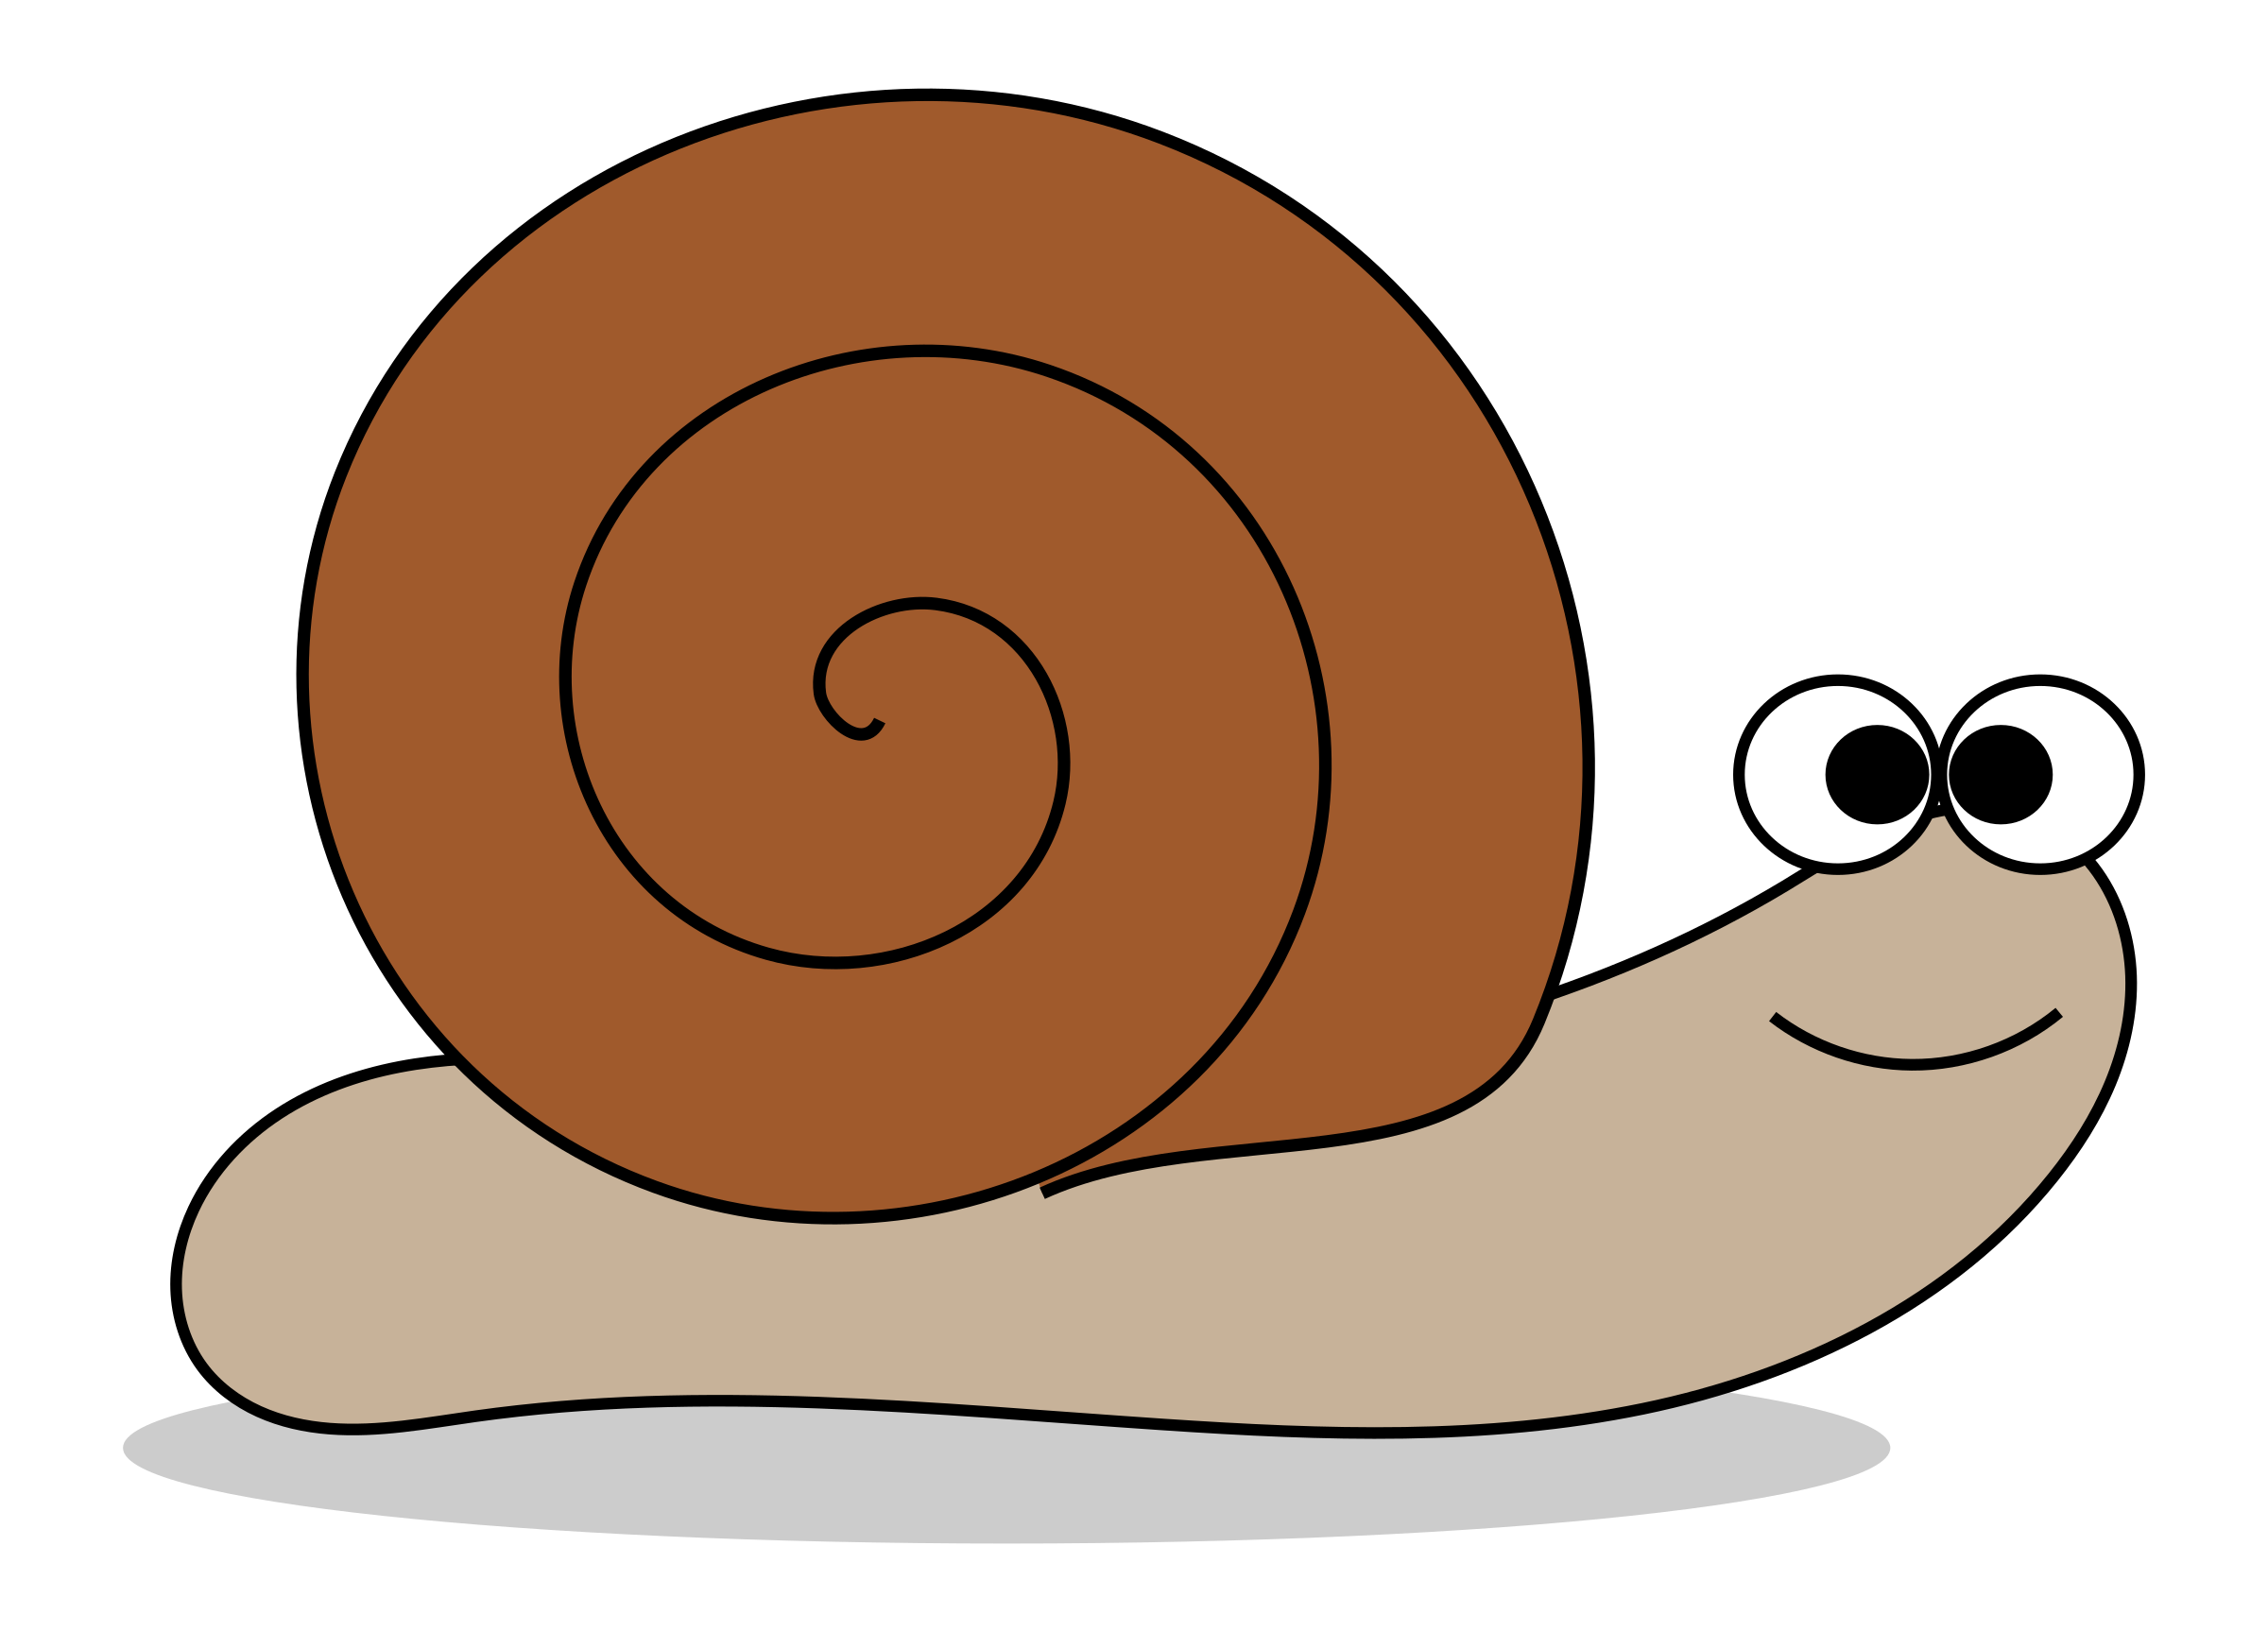 Clipart Snail